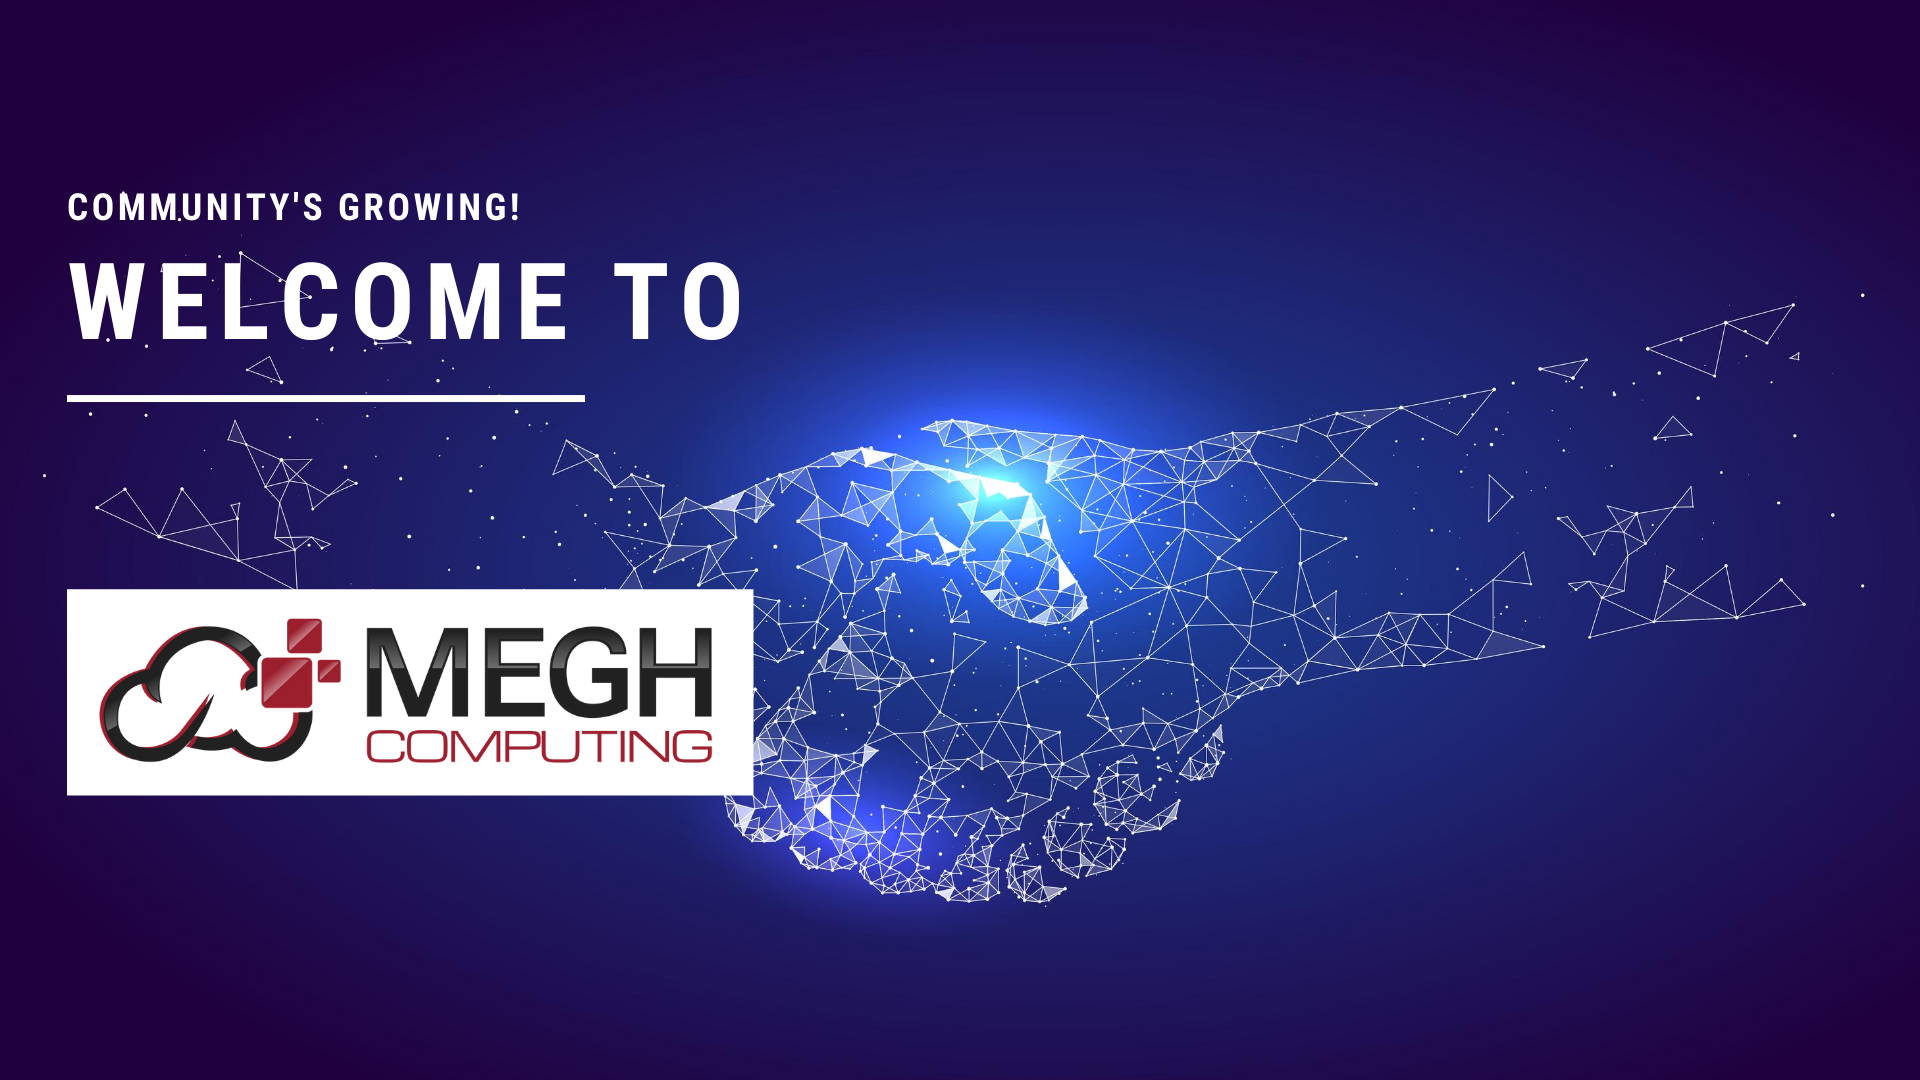 WELCOME TO MEGH COMPUTING!